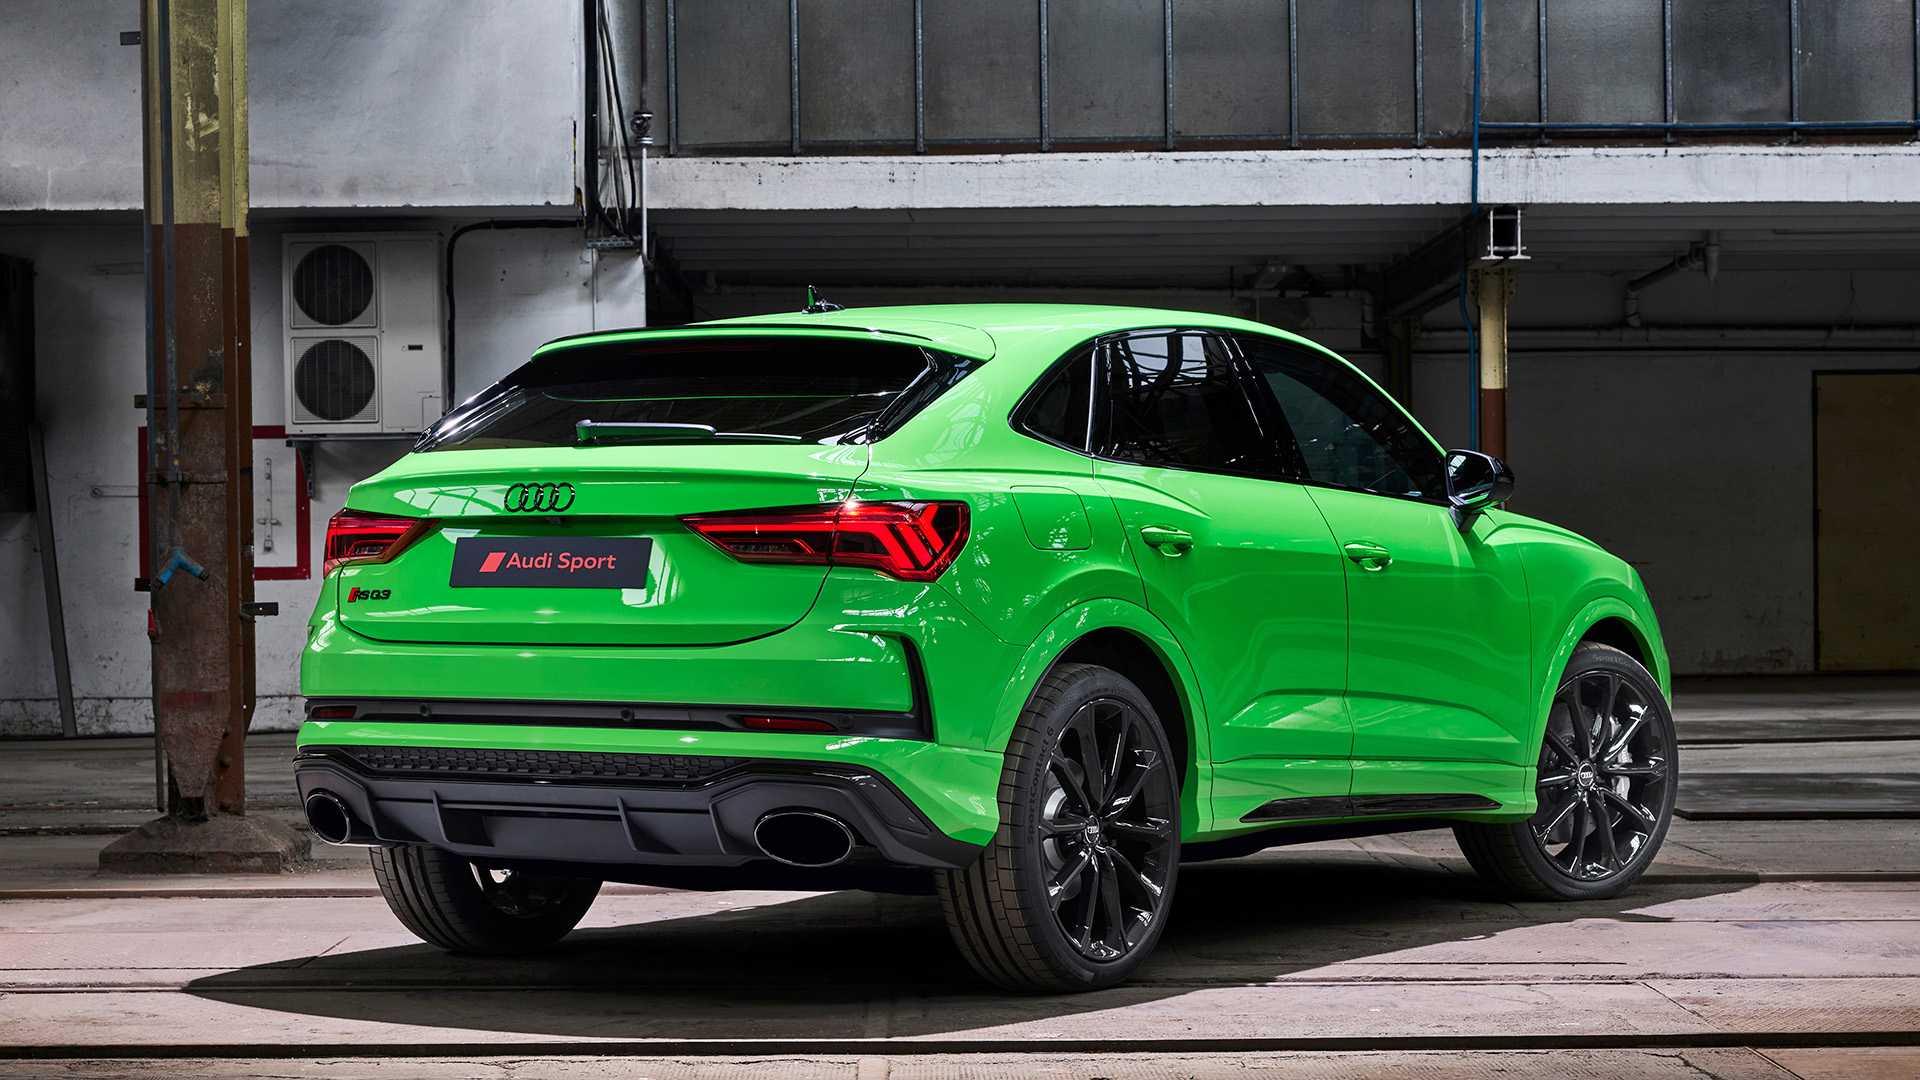 Kelebihan Kekurangan Audi Rs Q3 Review